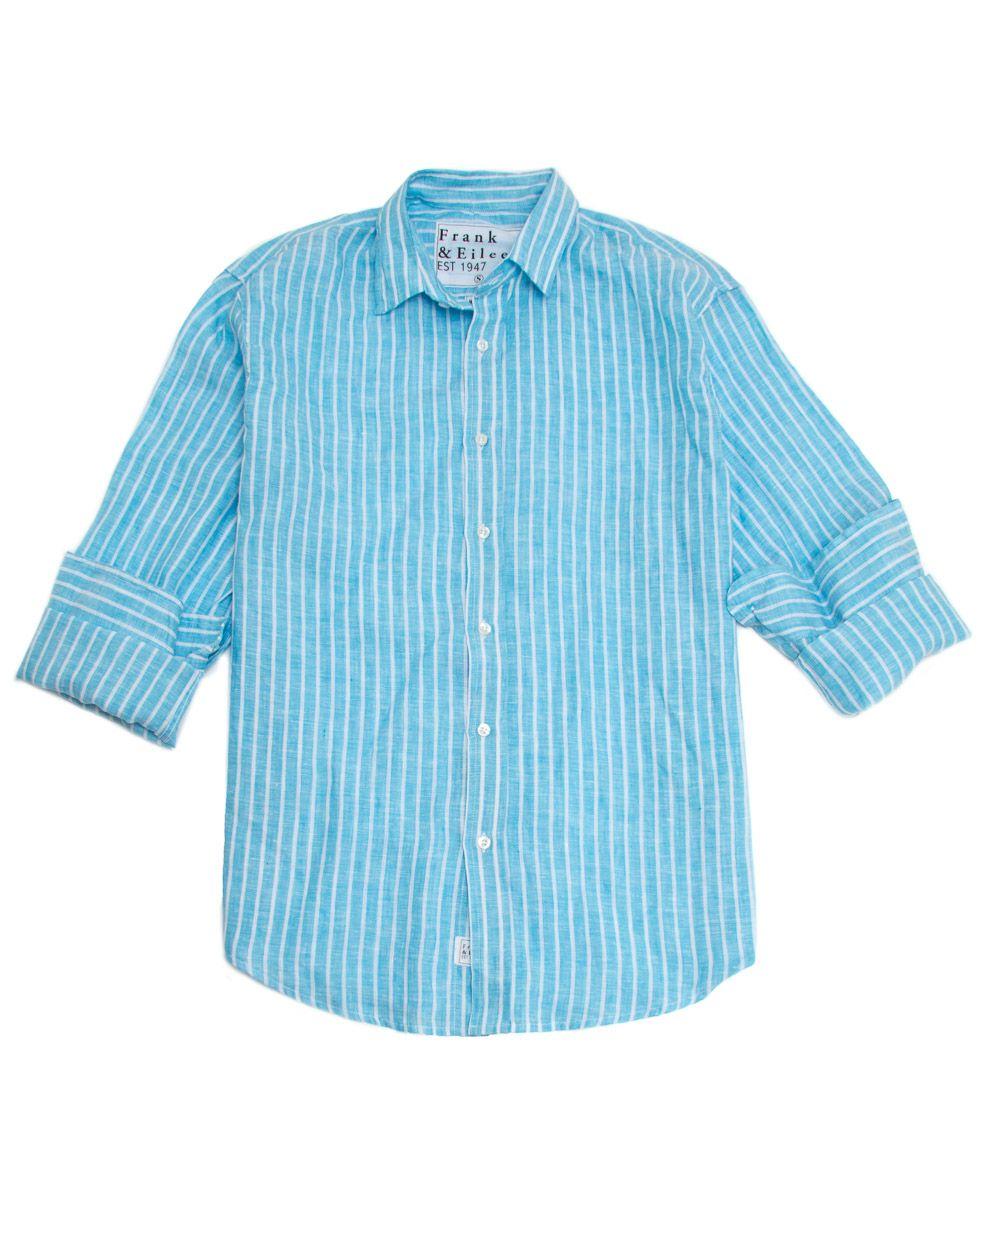 Frank & Eileen Paul Bright Blue Stripe Italian Linen Shirt Classic